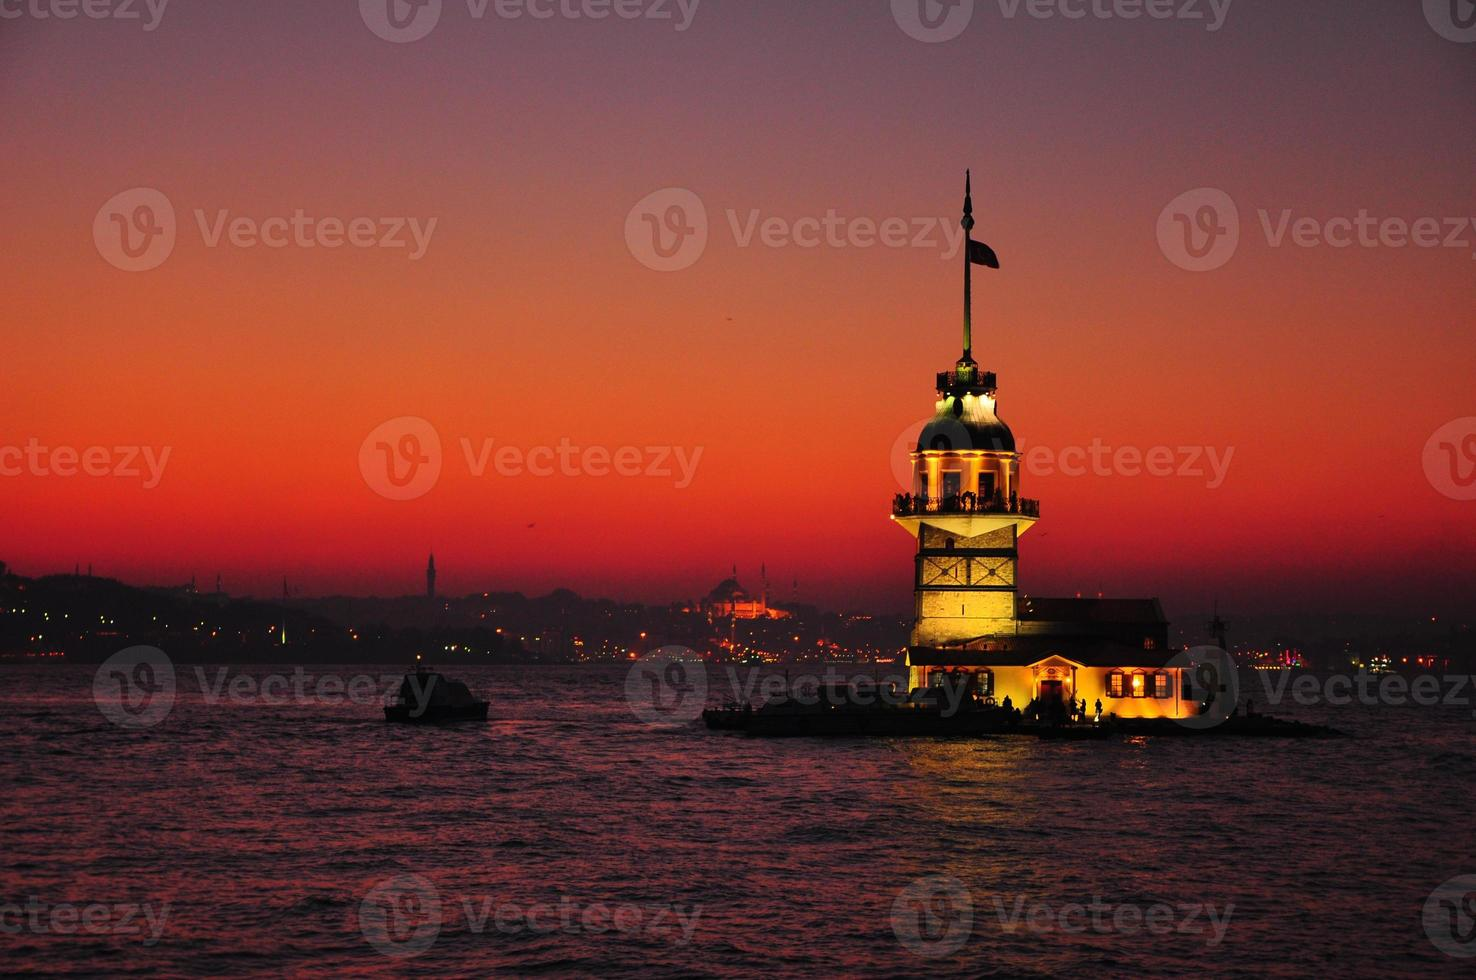 jungfru tornet i solnedgången foto